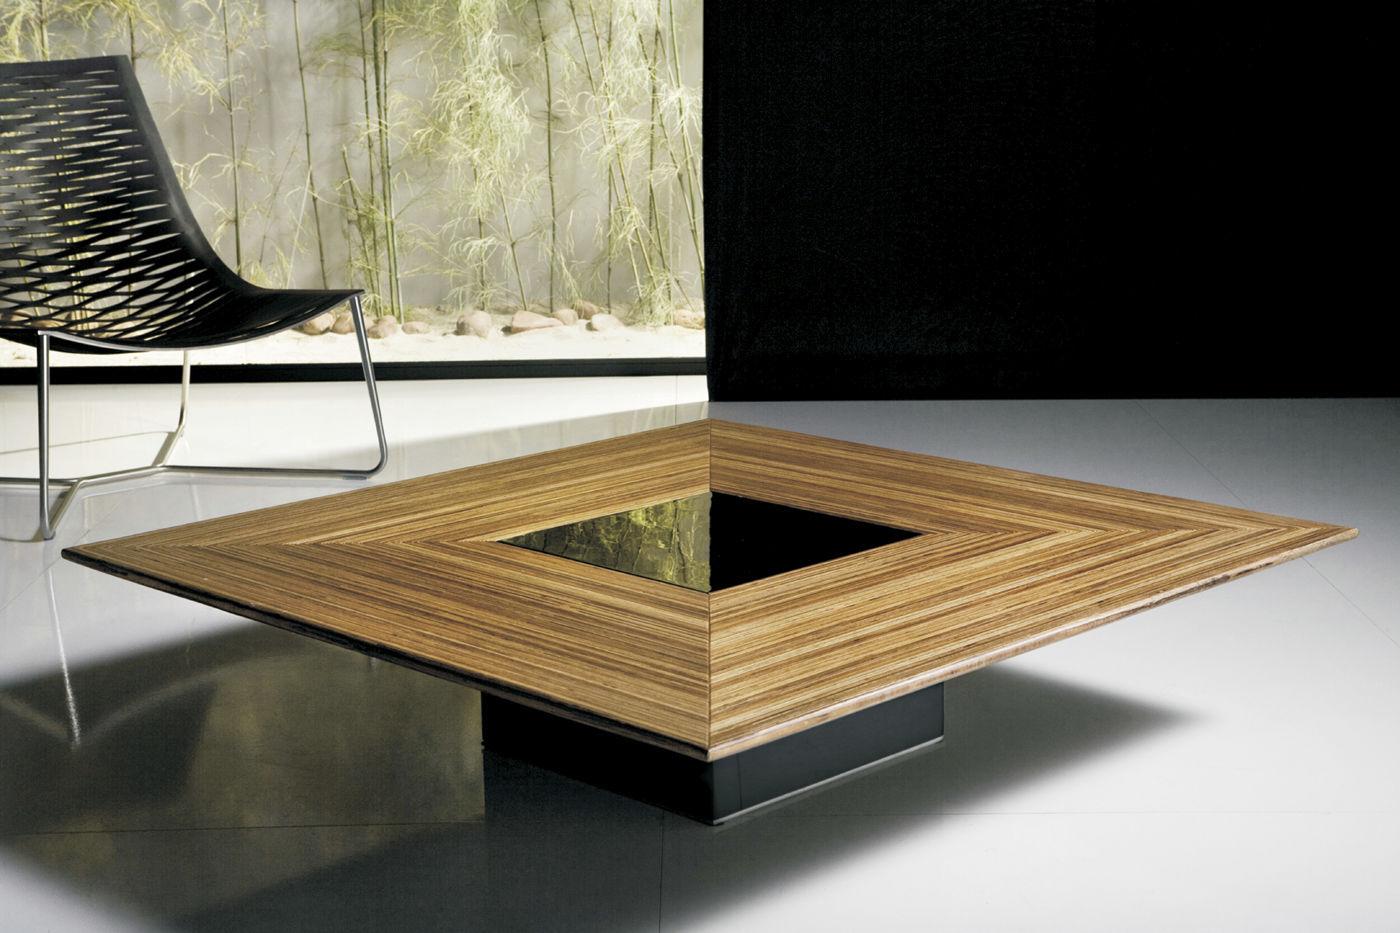 Grande Table Basse Bois contemporary coffee table / wooden / square - fitzroy - modloft